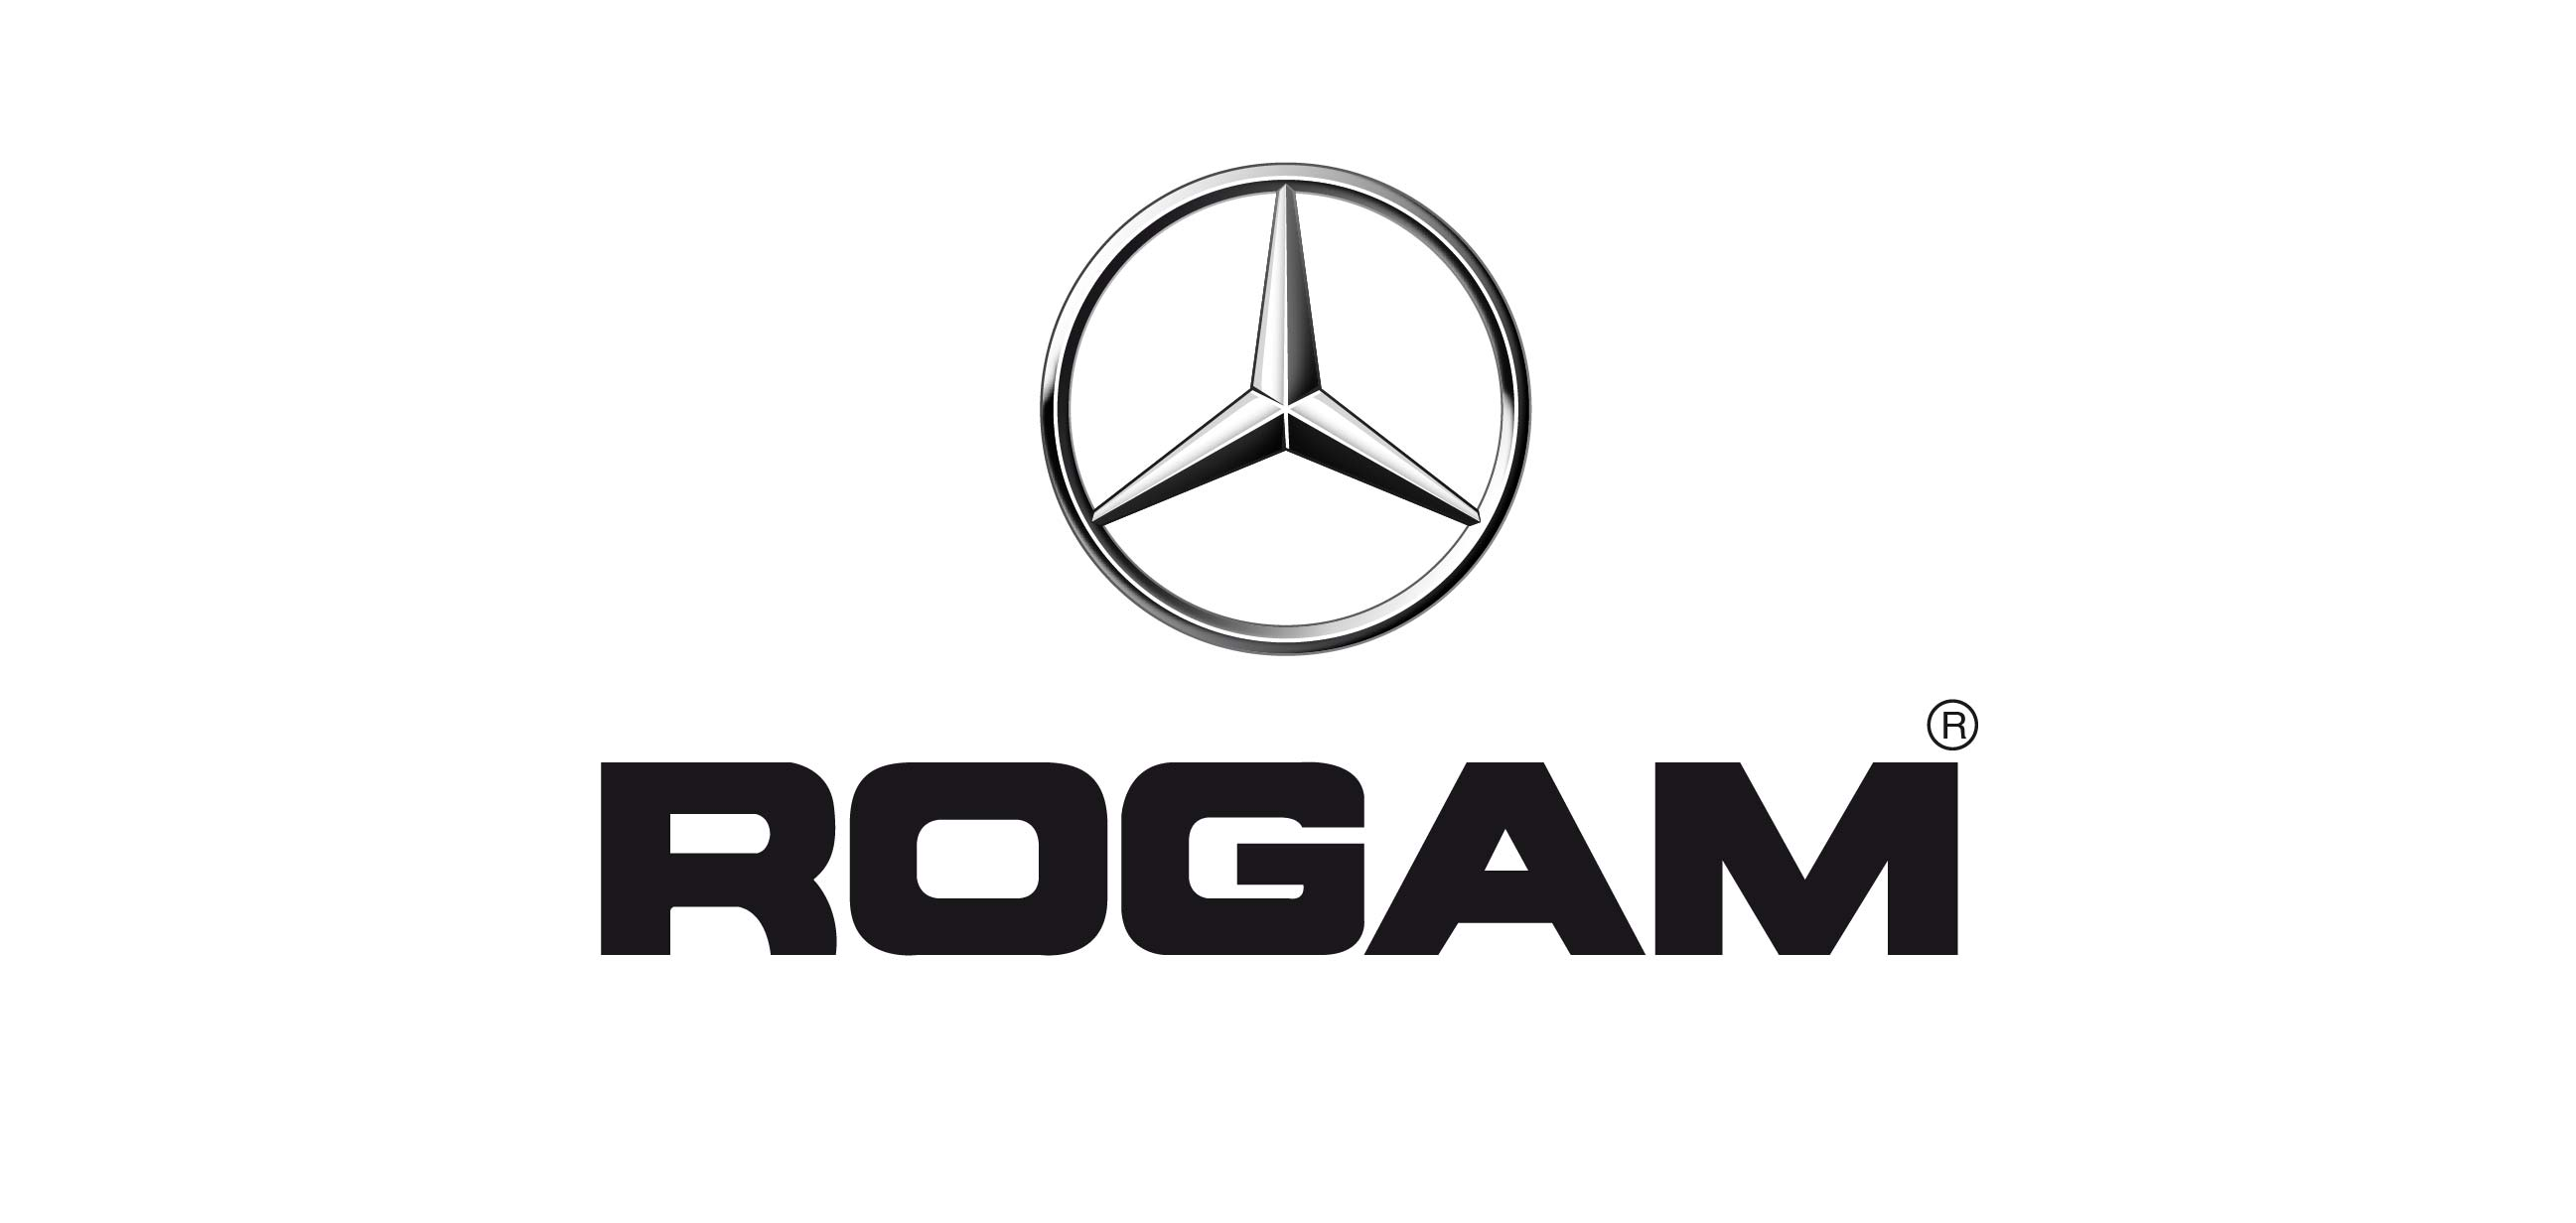 ROGAM